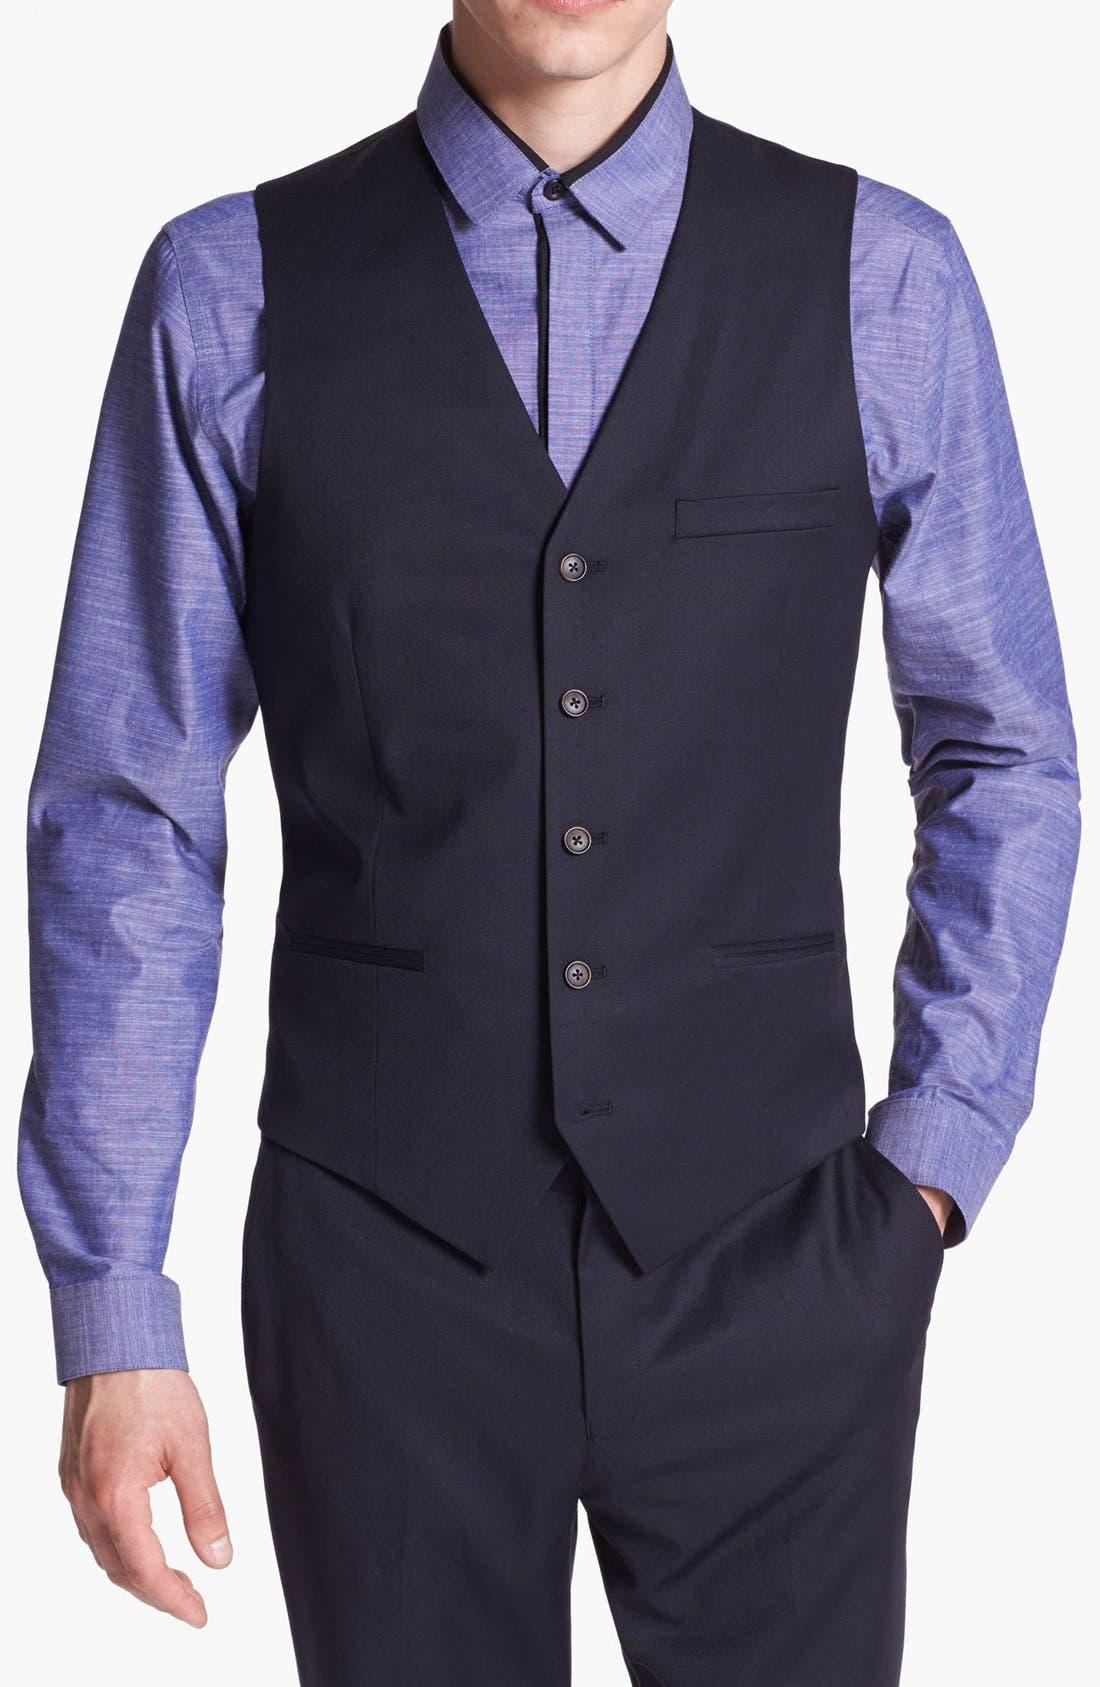 Alternate Image 1 Selected - Topman Skinny Fit Waistcoat